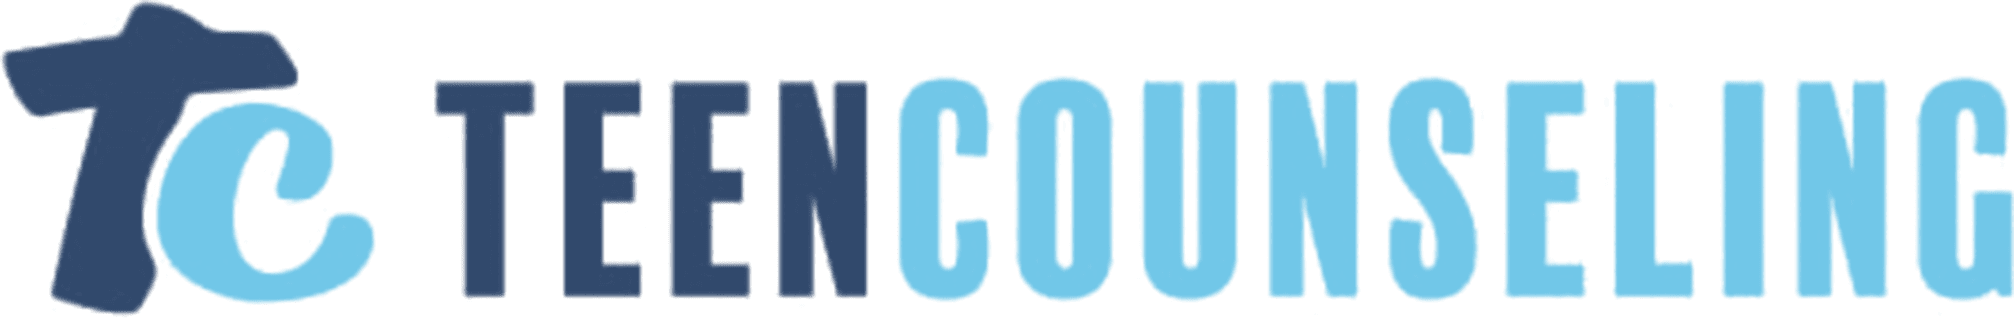 Teen Counseling logo